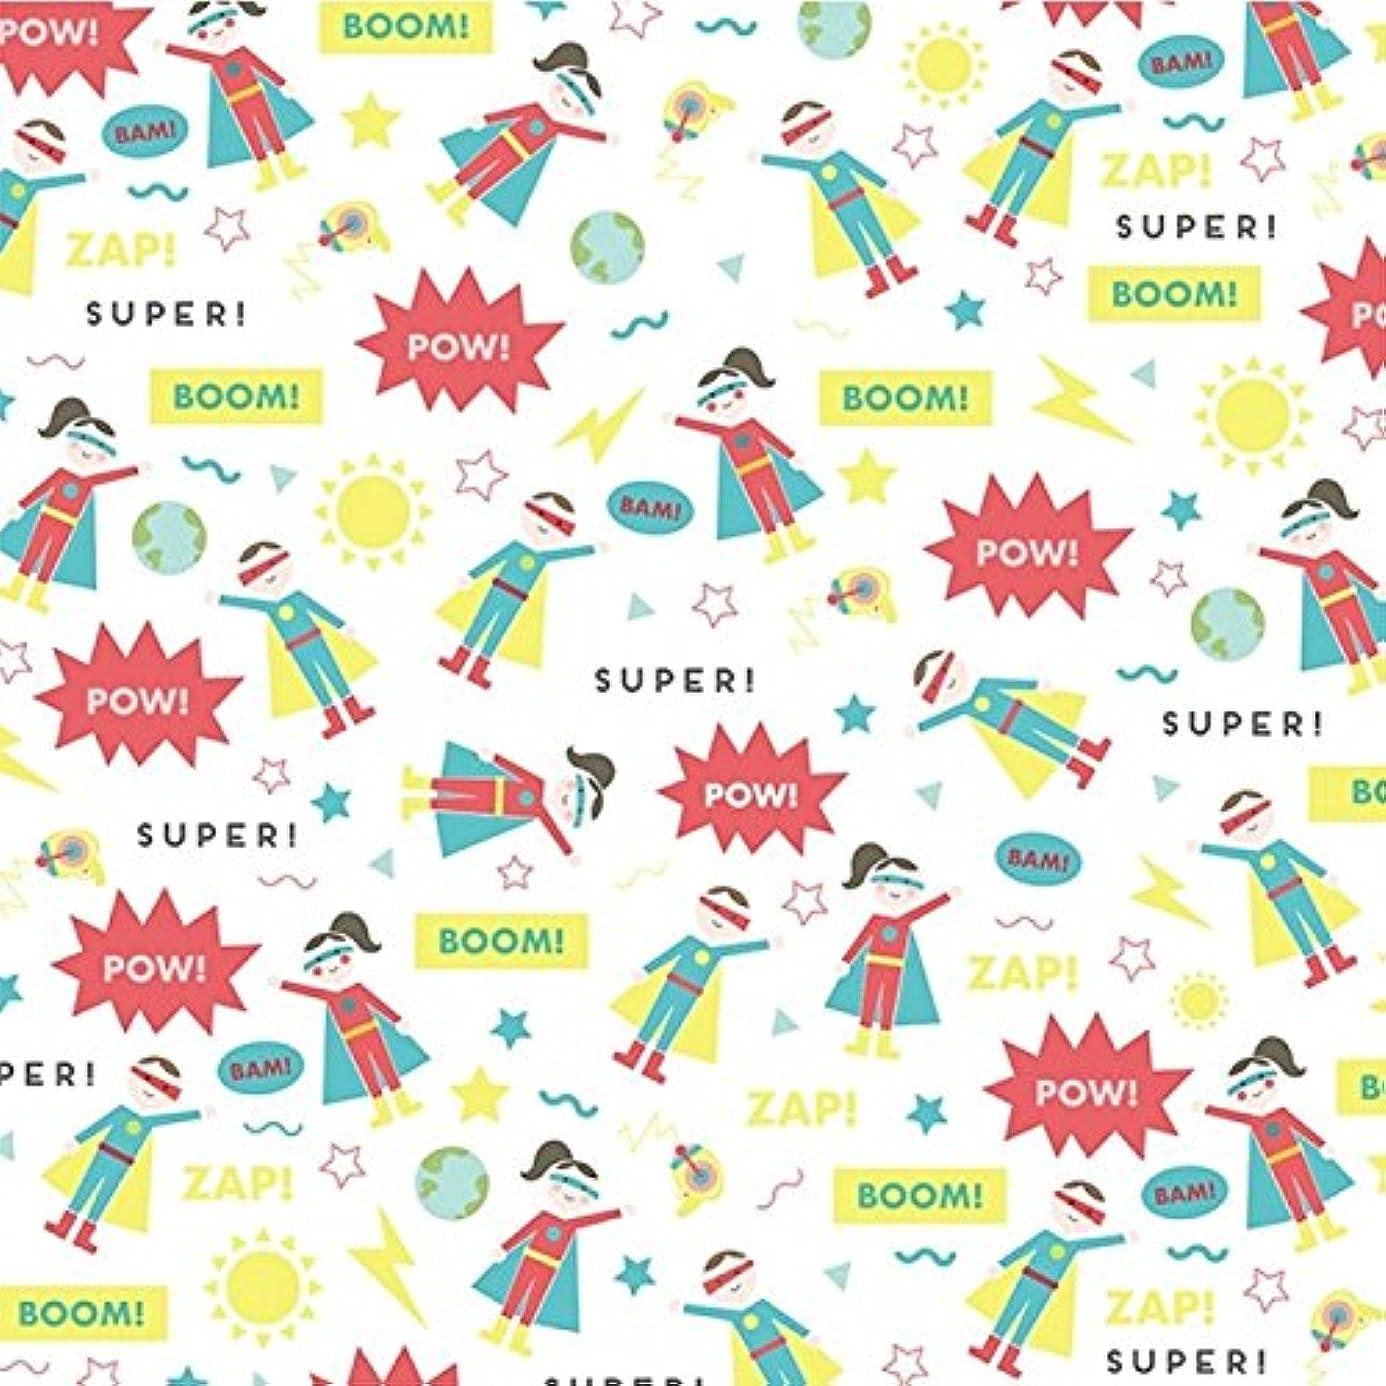 Karen Foster Design 12 x 12-Inch Scrapbooking Paper, 25 Sheets, Super Me! nab0524232